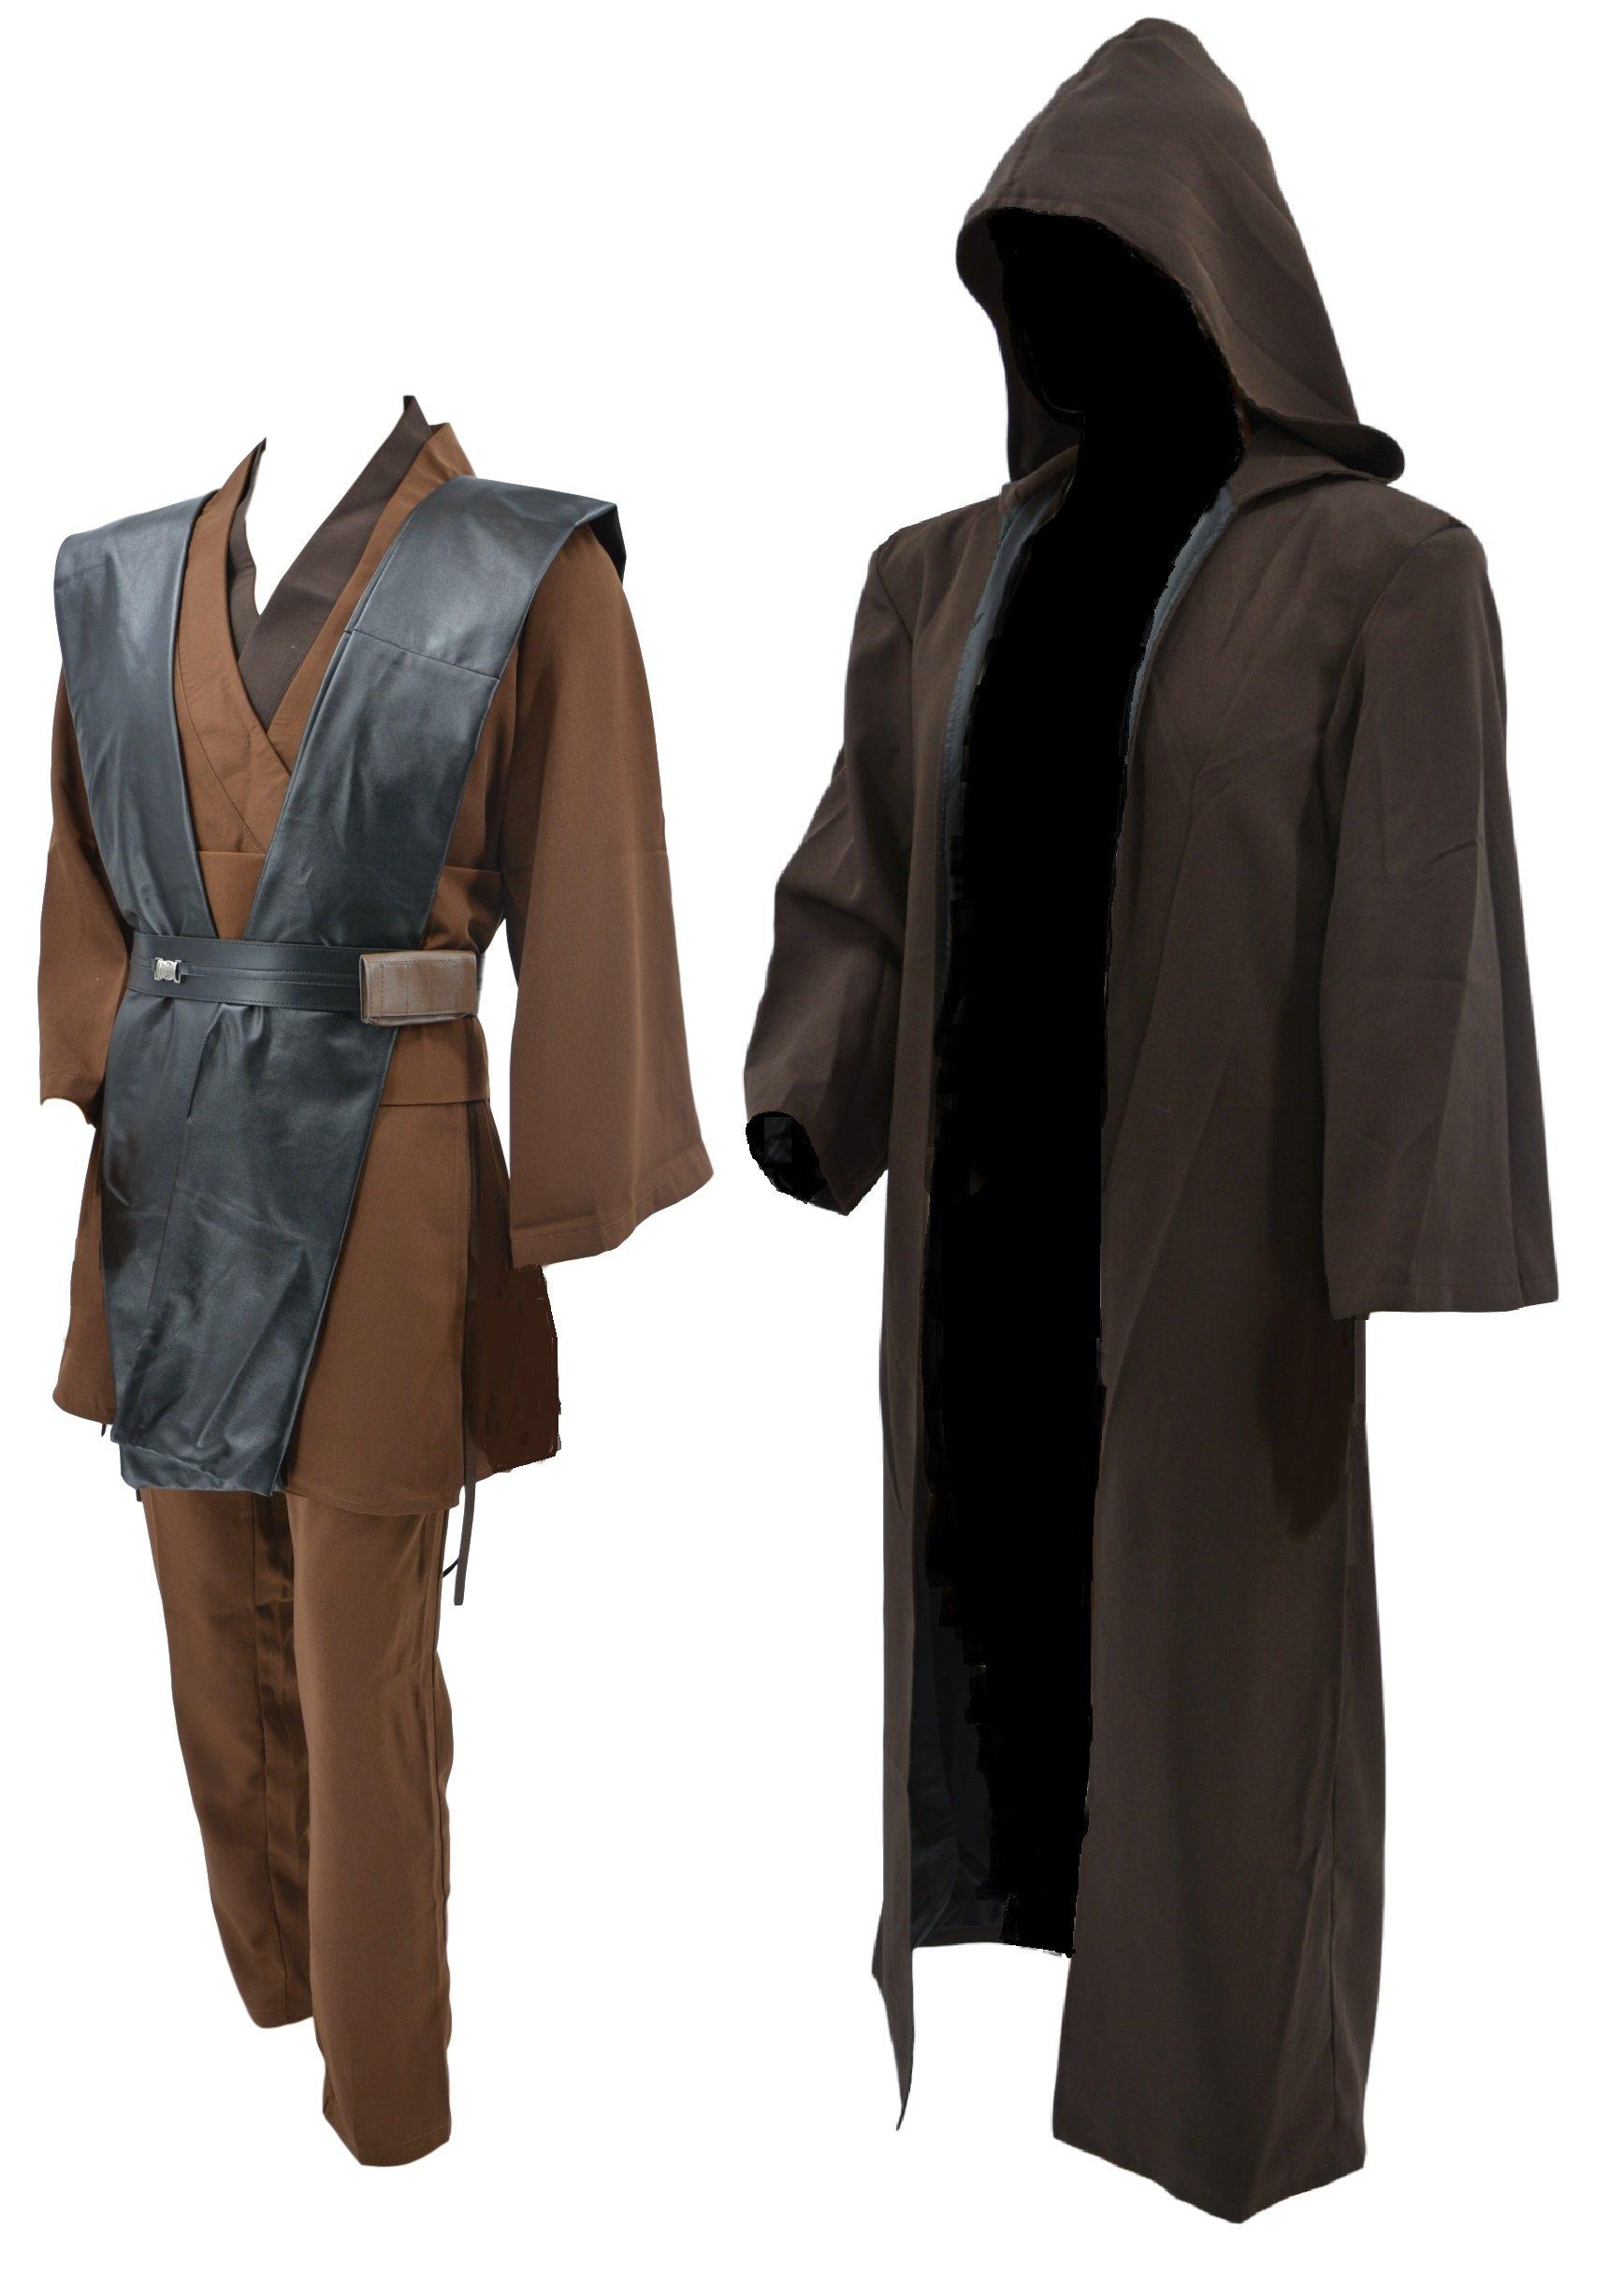 hideaway Star Wars Adult Deluxe Anakin Skywalker Costume [ Size : M, L, XL ] Cosplay (XL)